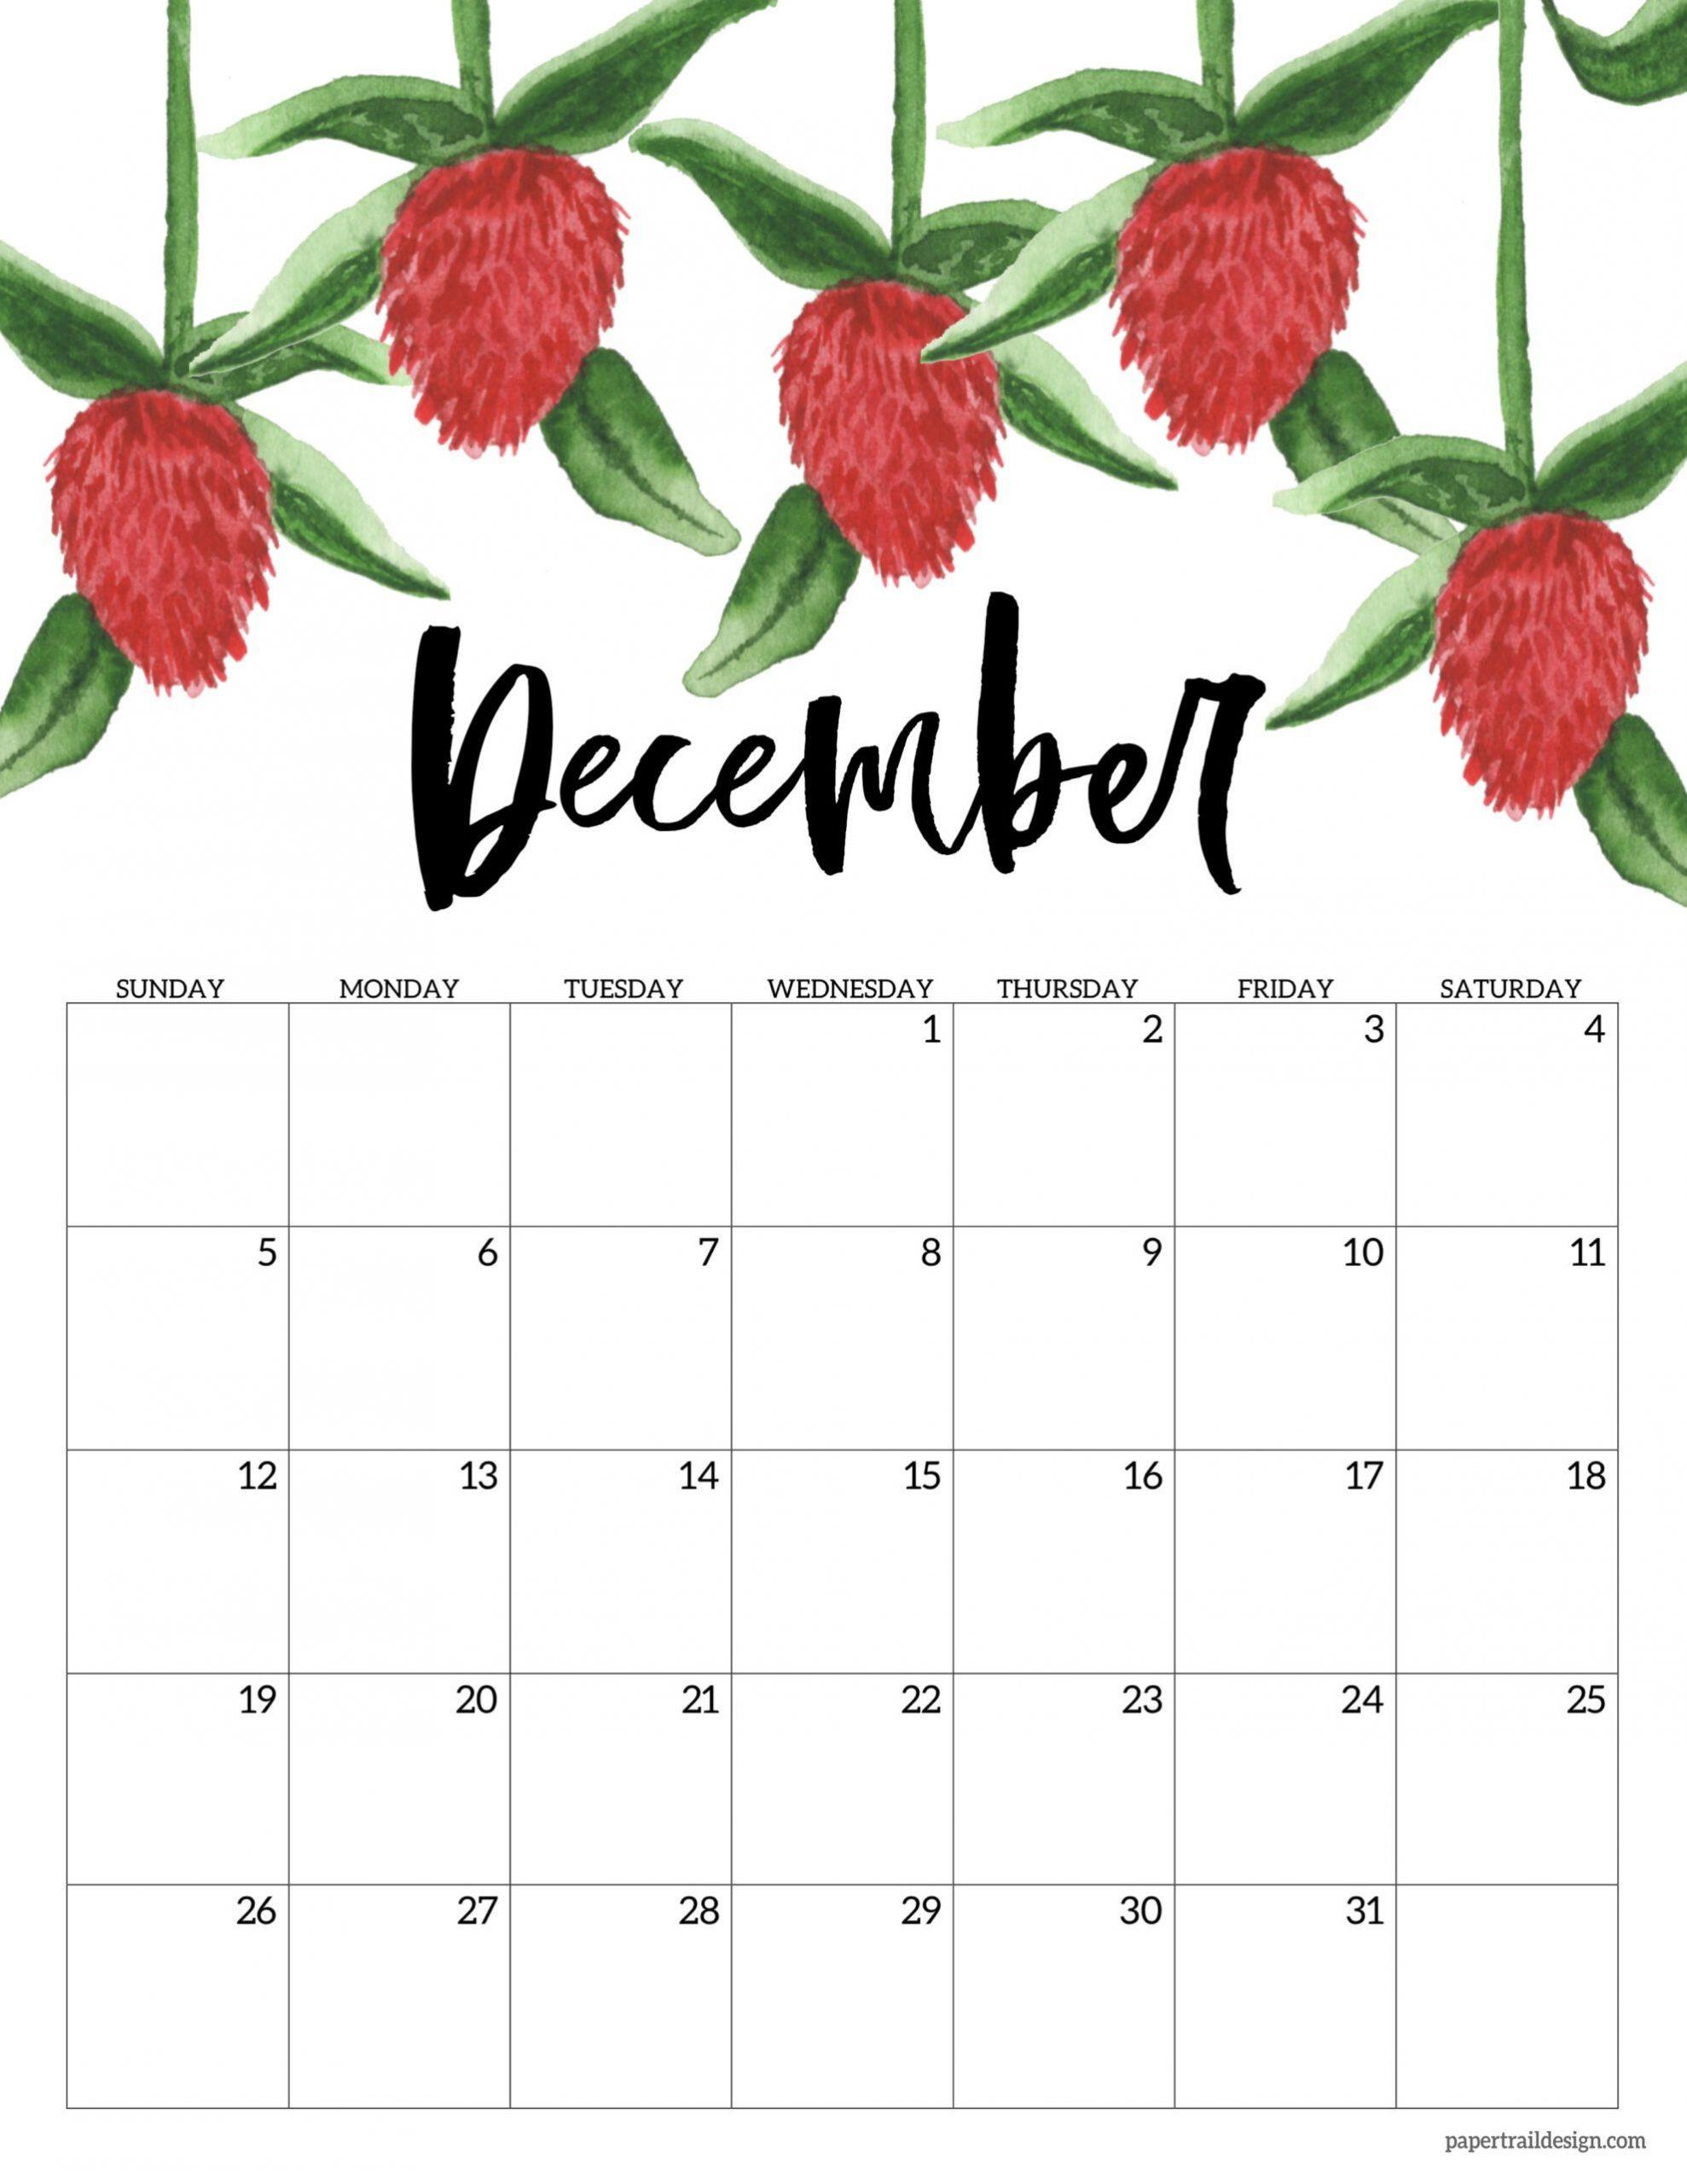 Free Printable 2021 Floral Calendar   Paper Trail Design